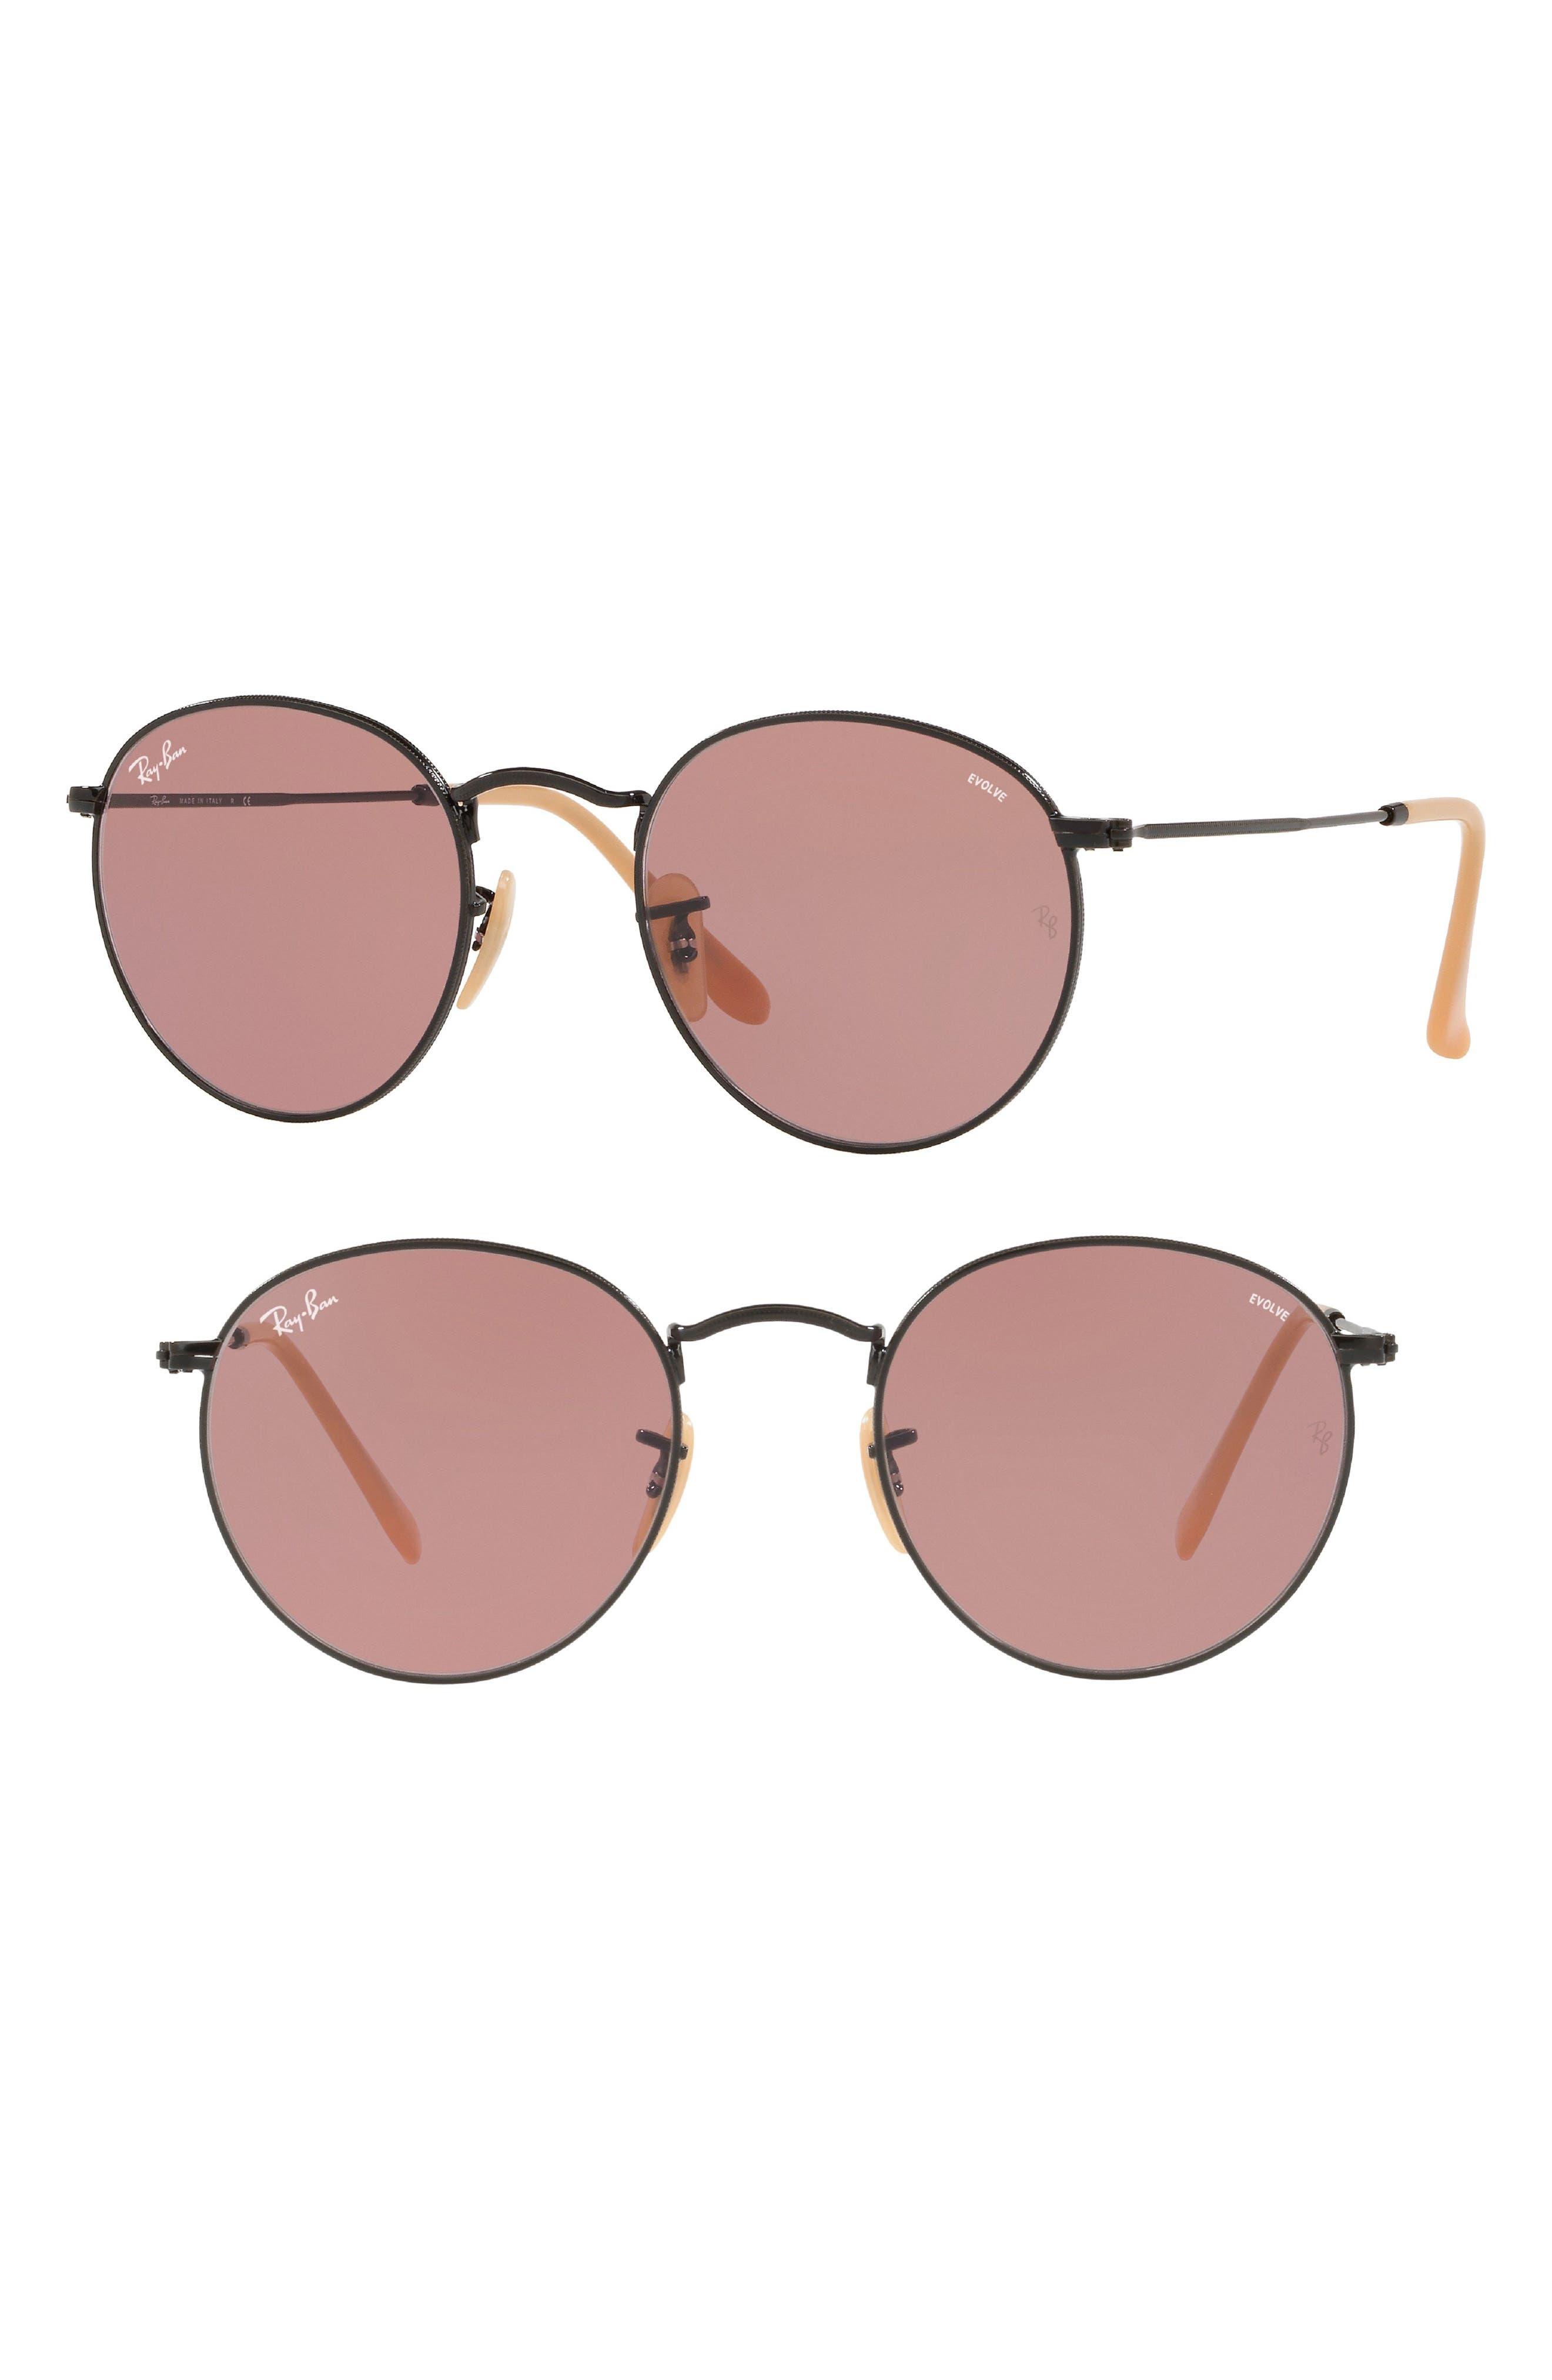 53mm Evolve Photochromic Round Sunglasses,                         Main,                         color, 001